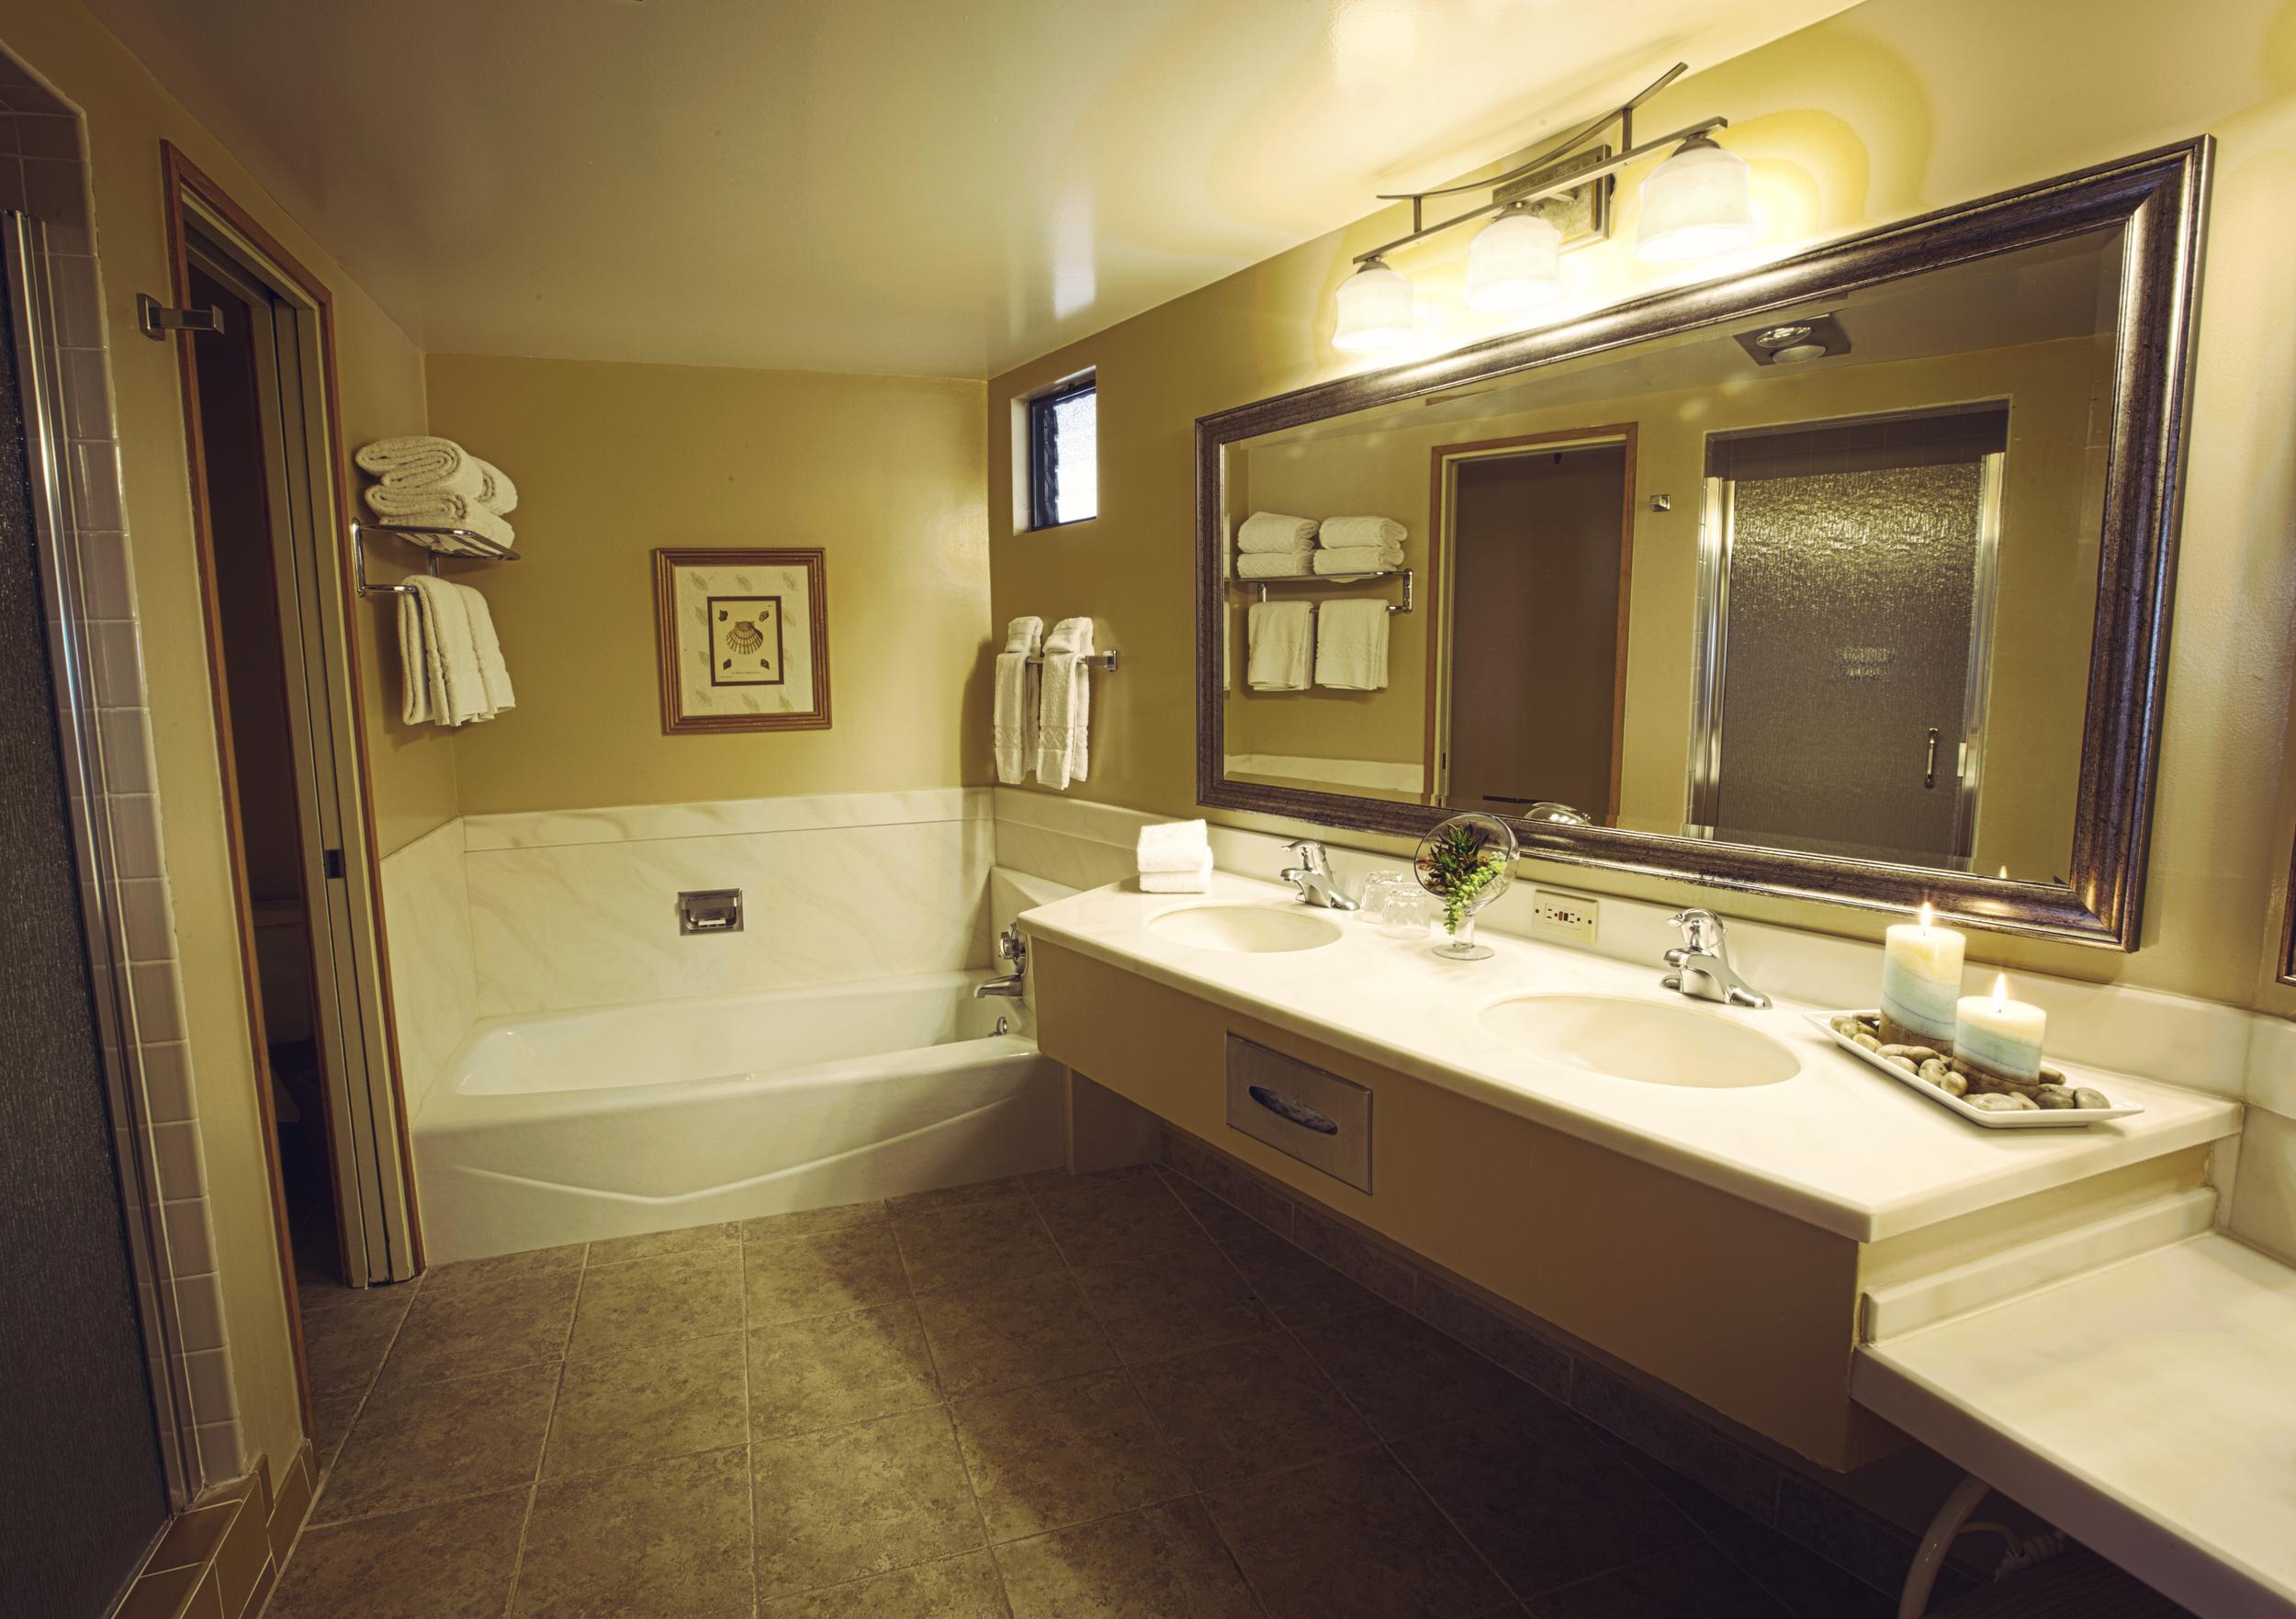 Bathroom_HDR_1_Flat.jpg